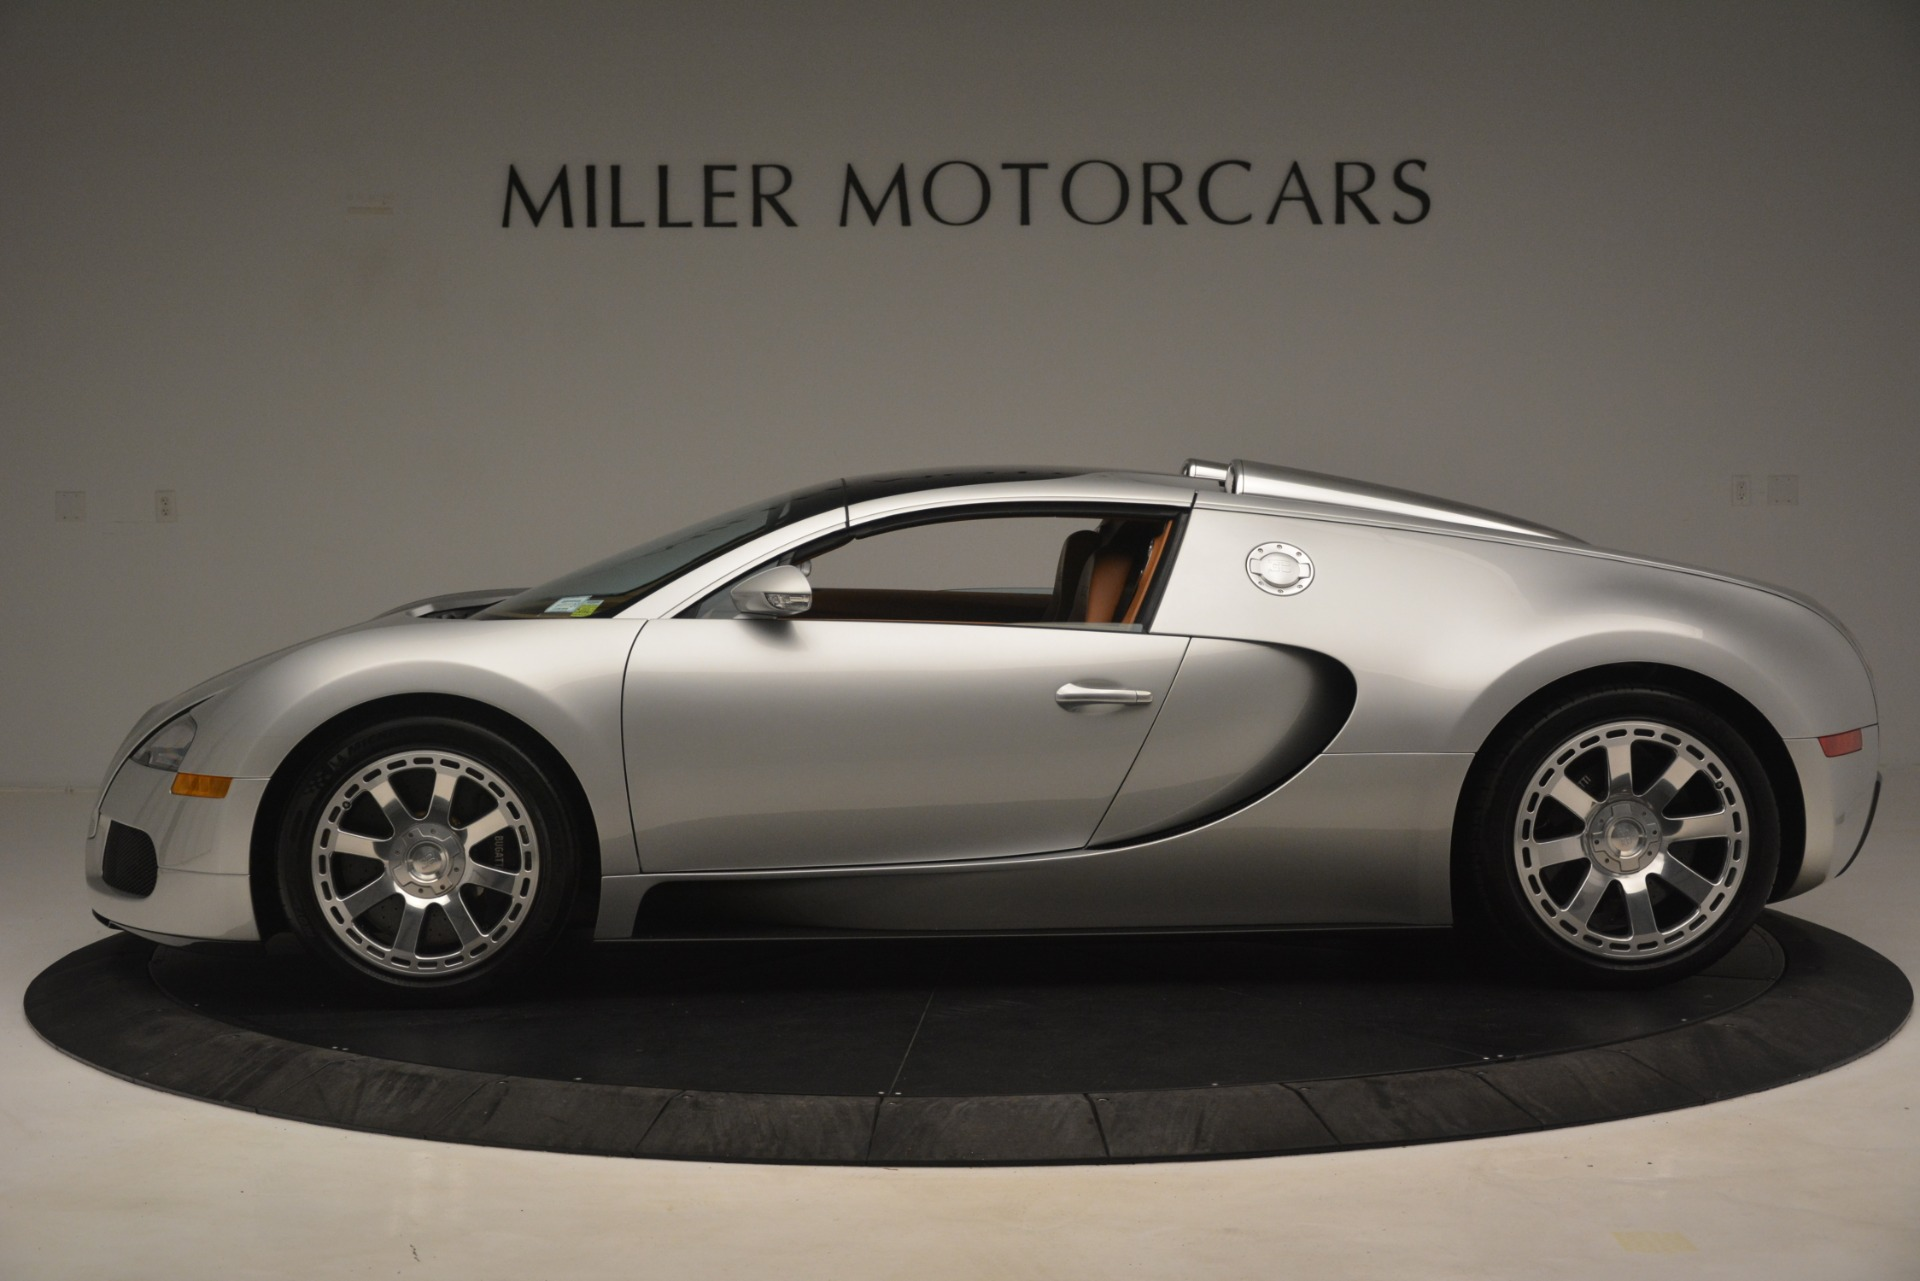 Used 2010 Bugatti Veyron 16.4 Grand Sport For Sale In Greenwich, CT 3159_p14